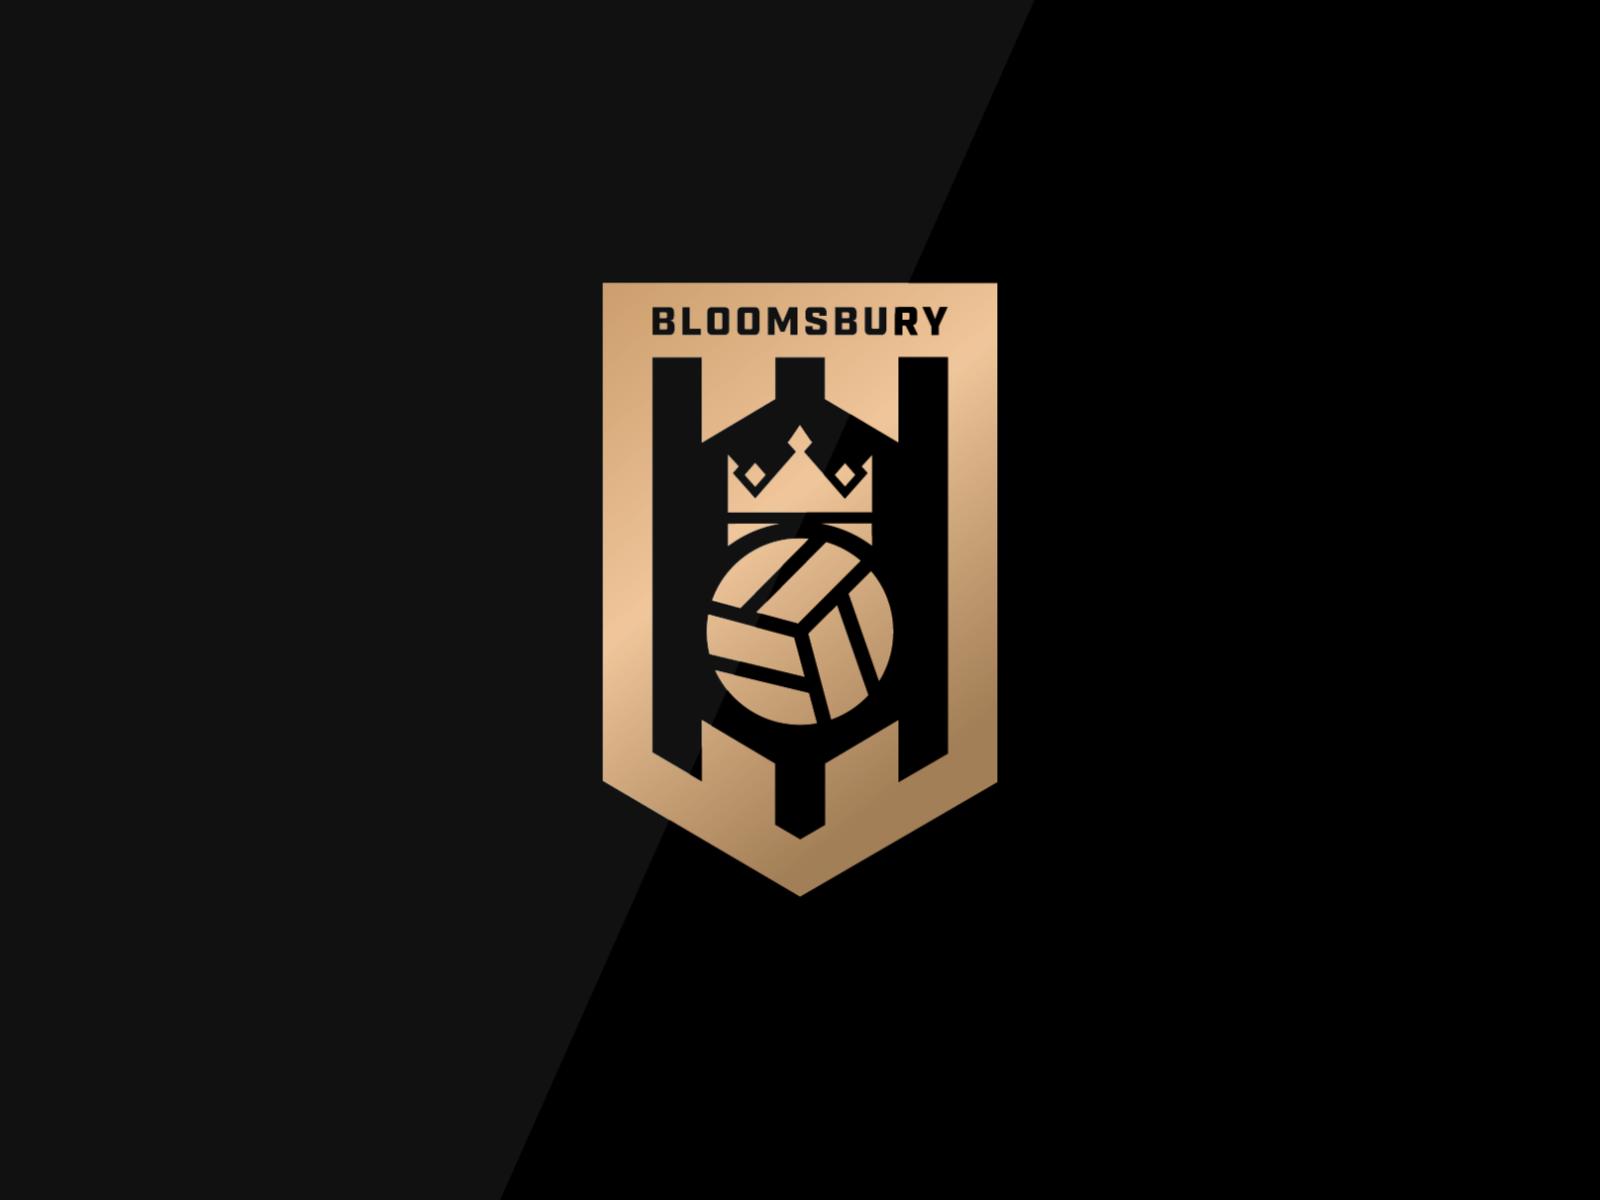 Bloomsbury Football